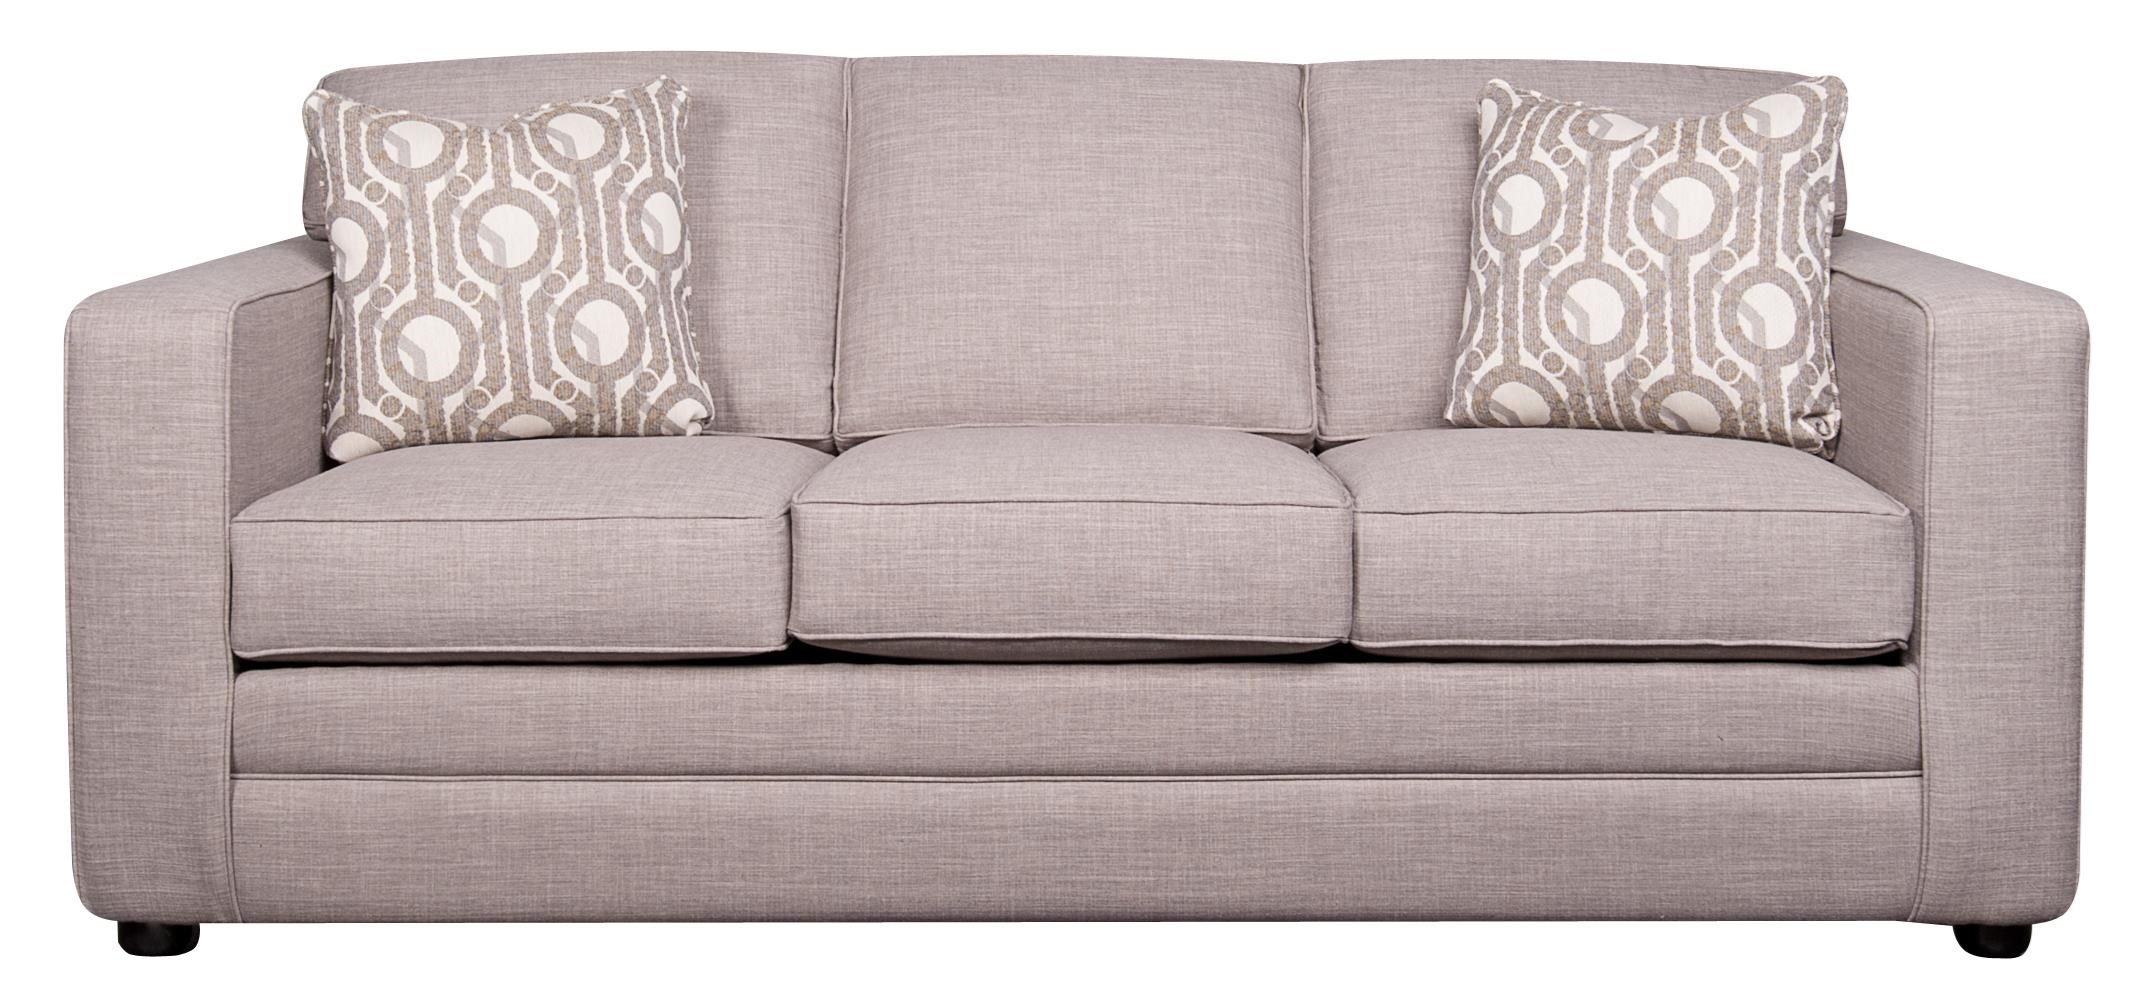 sofas in columbus ohio orange leather contemporary sofa serta stationary gallery 1